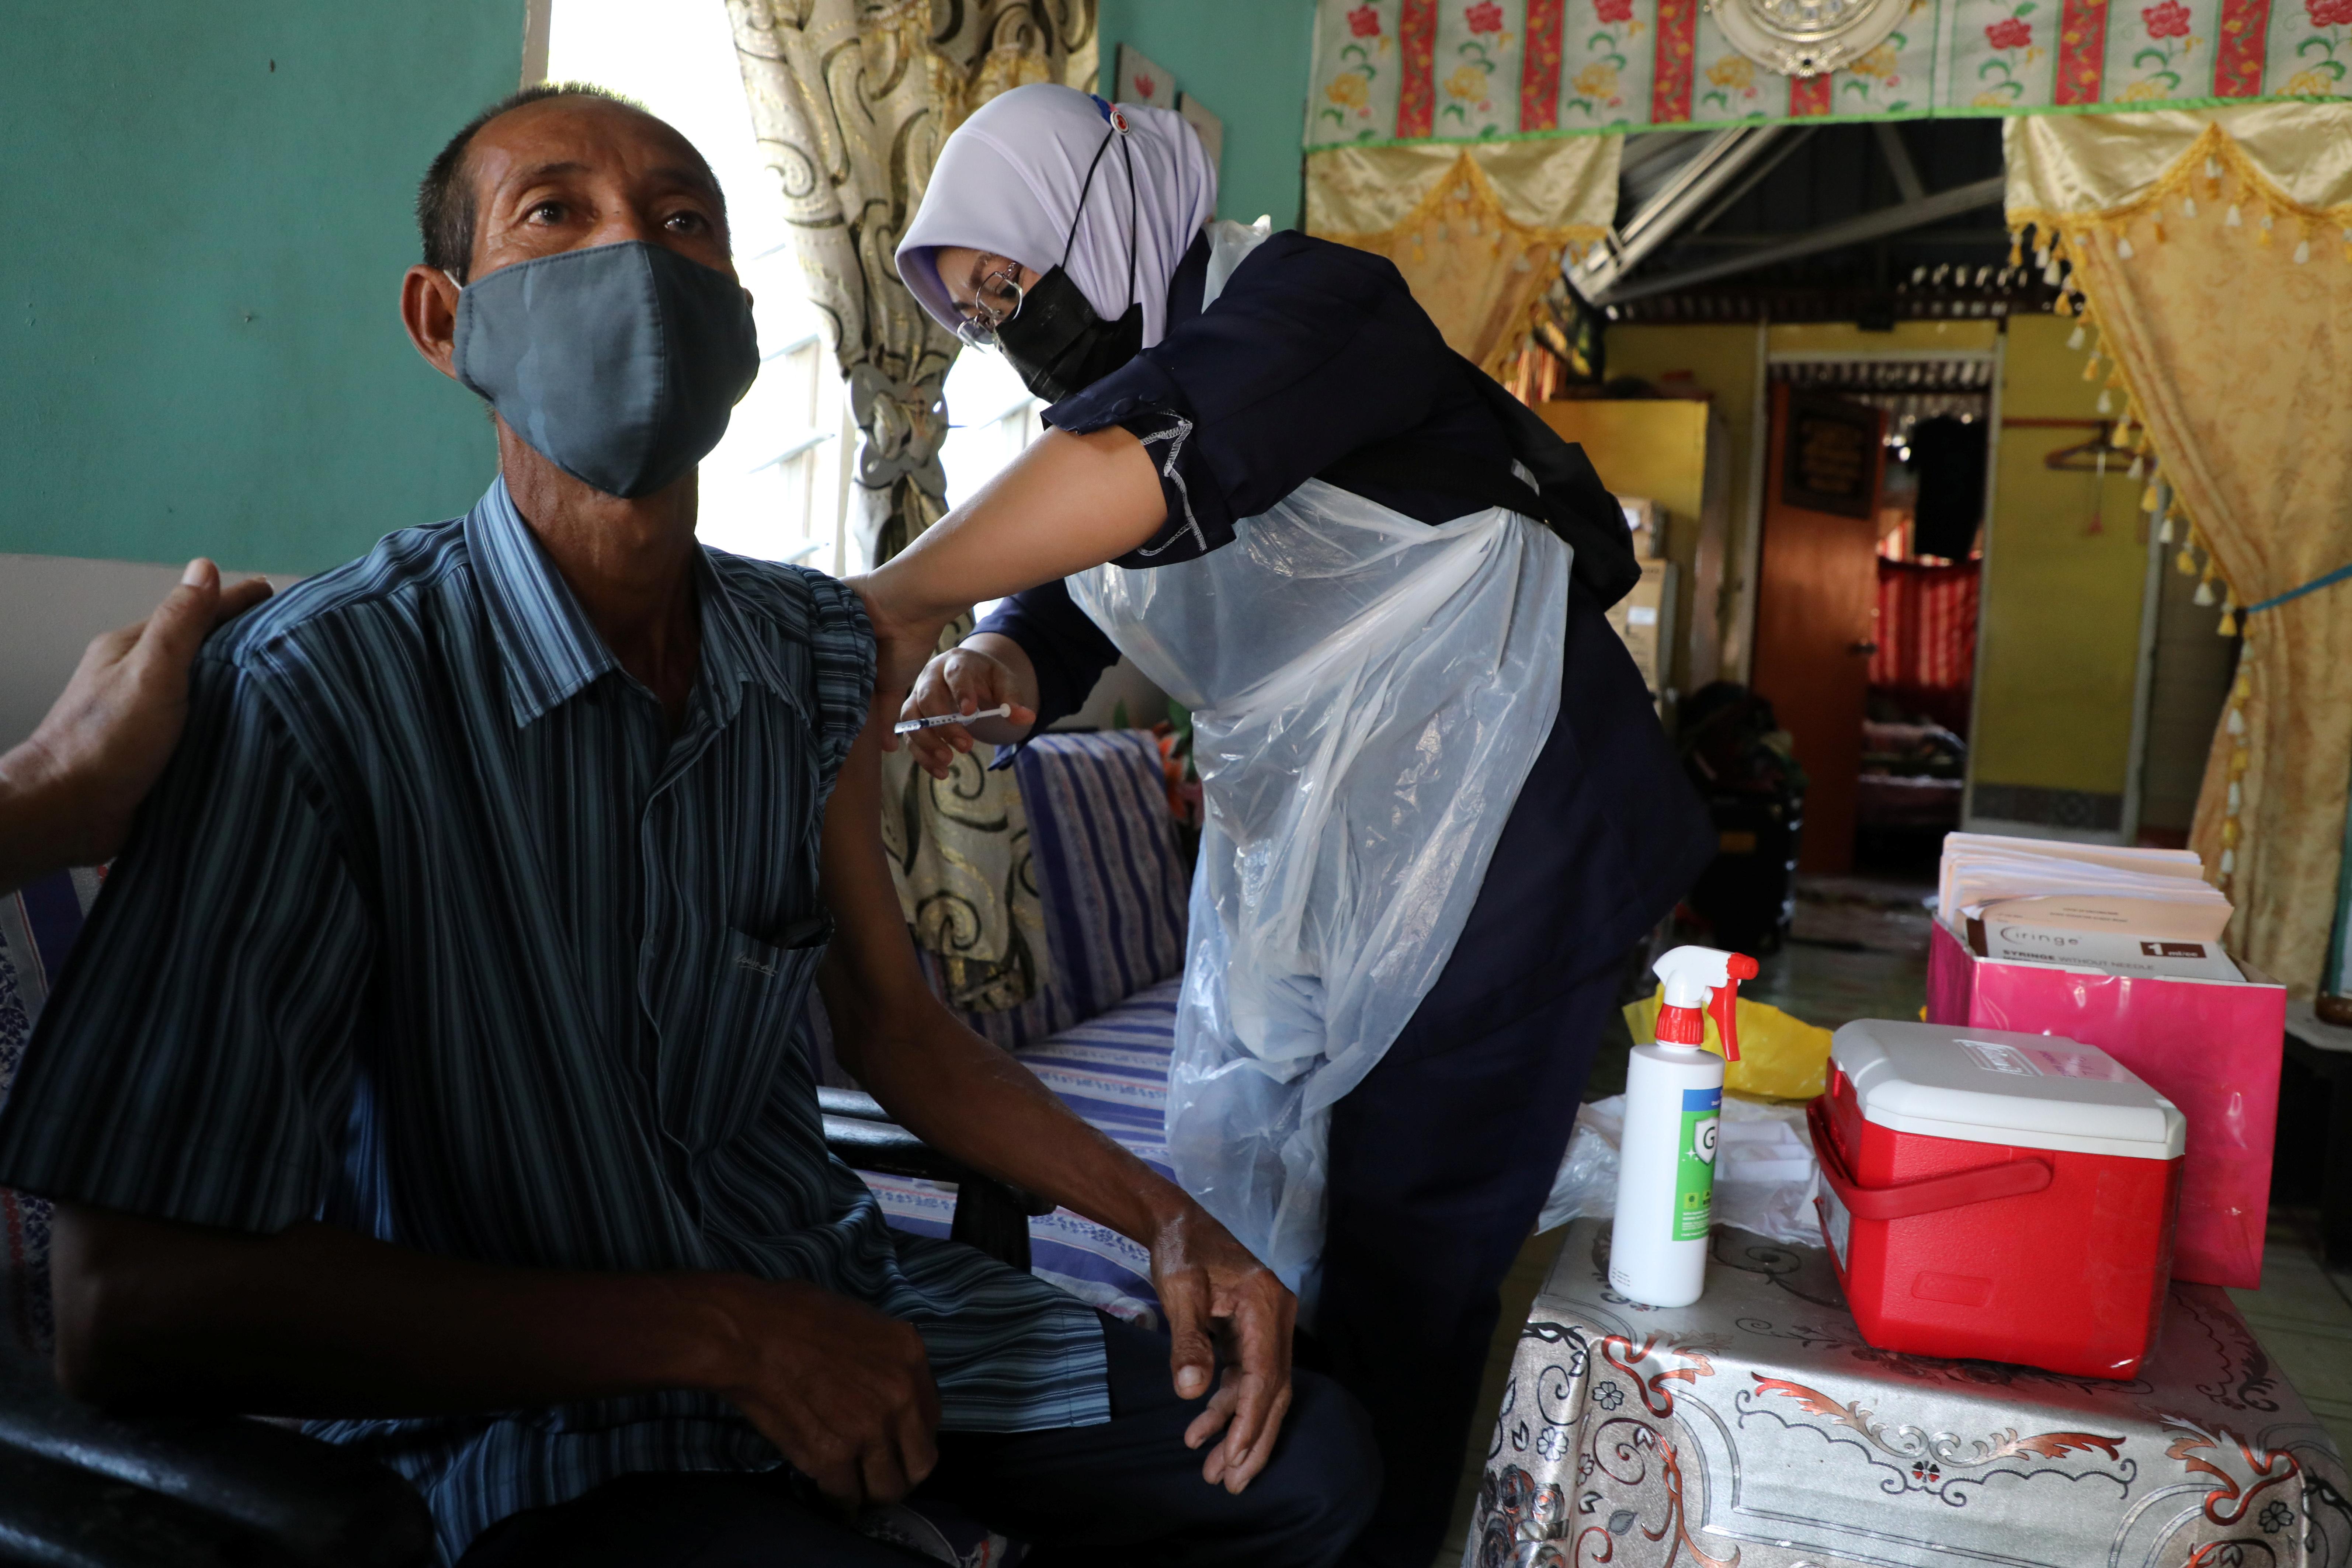 A healthcare worker administers the Sinovac coronavirus disease (COVID-19) vaccine to an elderly man at his home in Sabak Bernam, Malaysia July 1, 2021. REUTERS/Lim Huey Teng